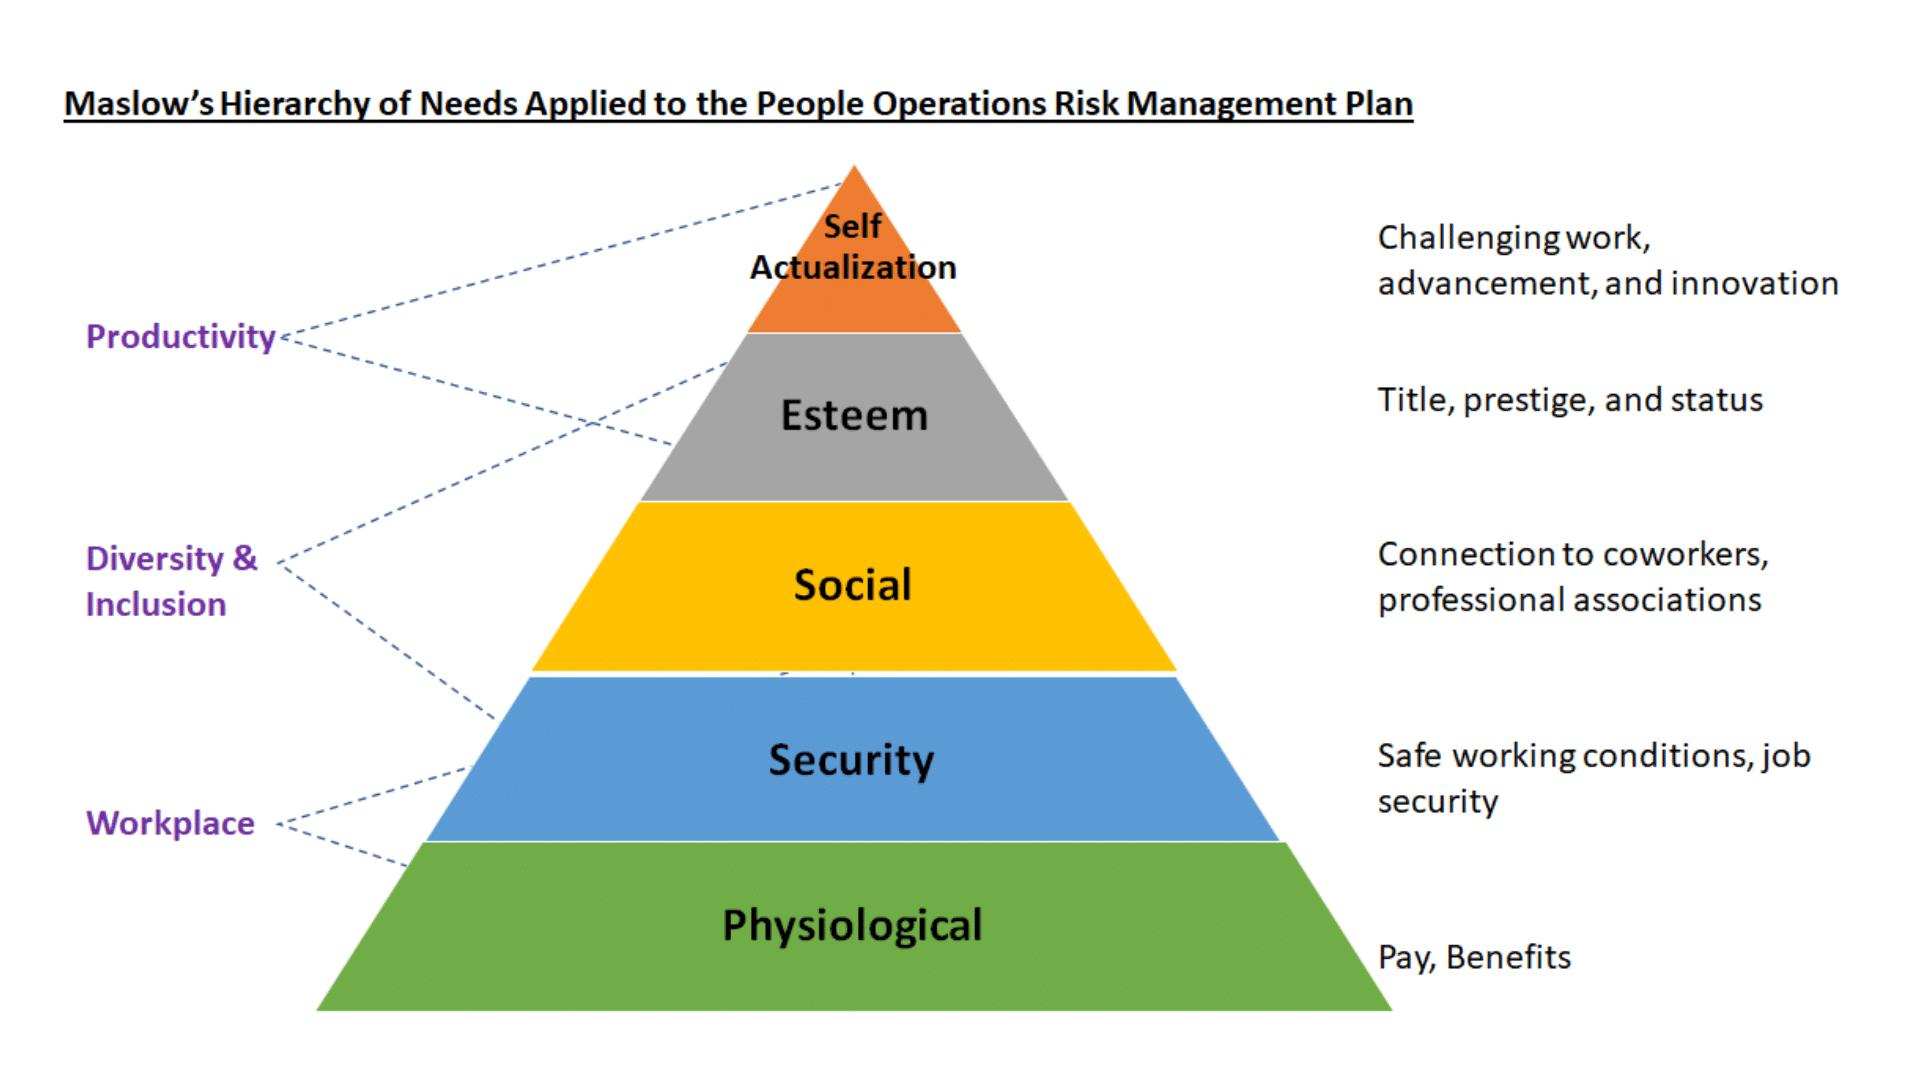 People Operations Risk Management Plan   Fahrenheit Advisors   November 2020